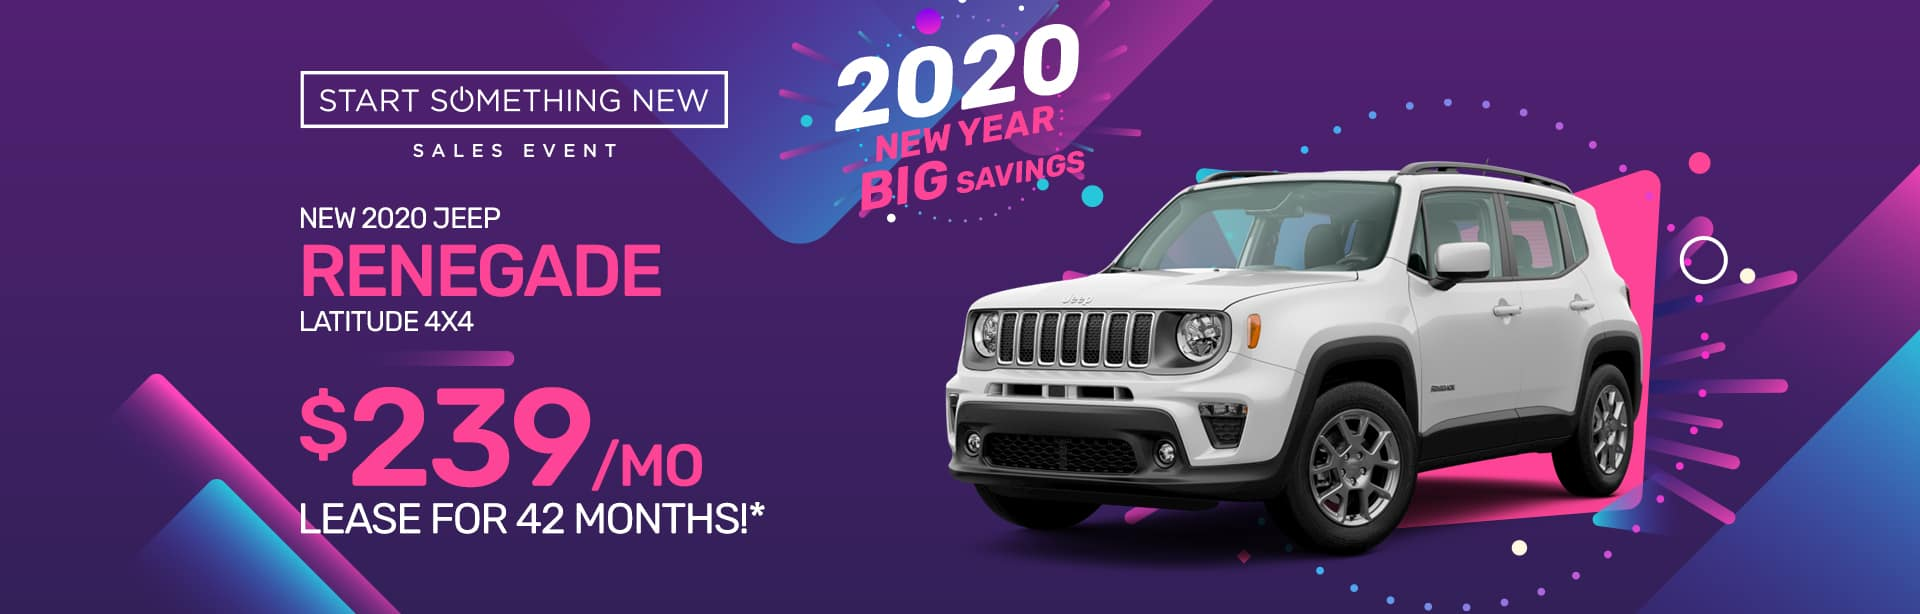 2020 Jeep Renegade Dealer near Terre Haute.